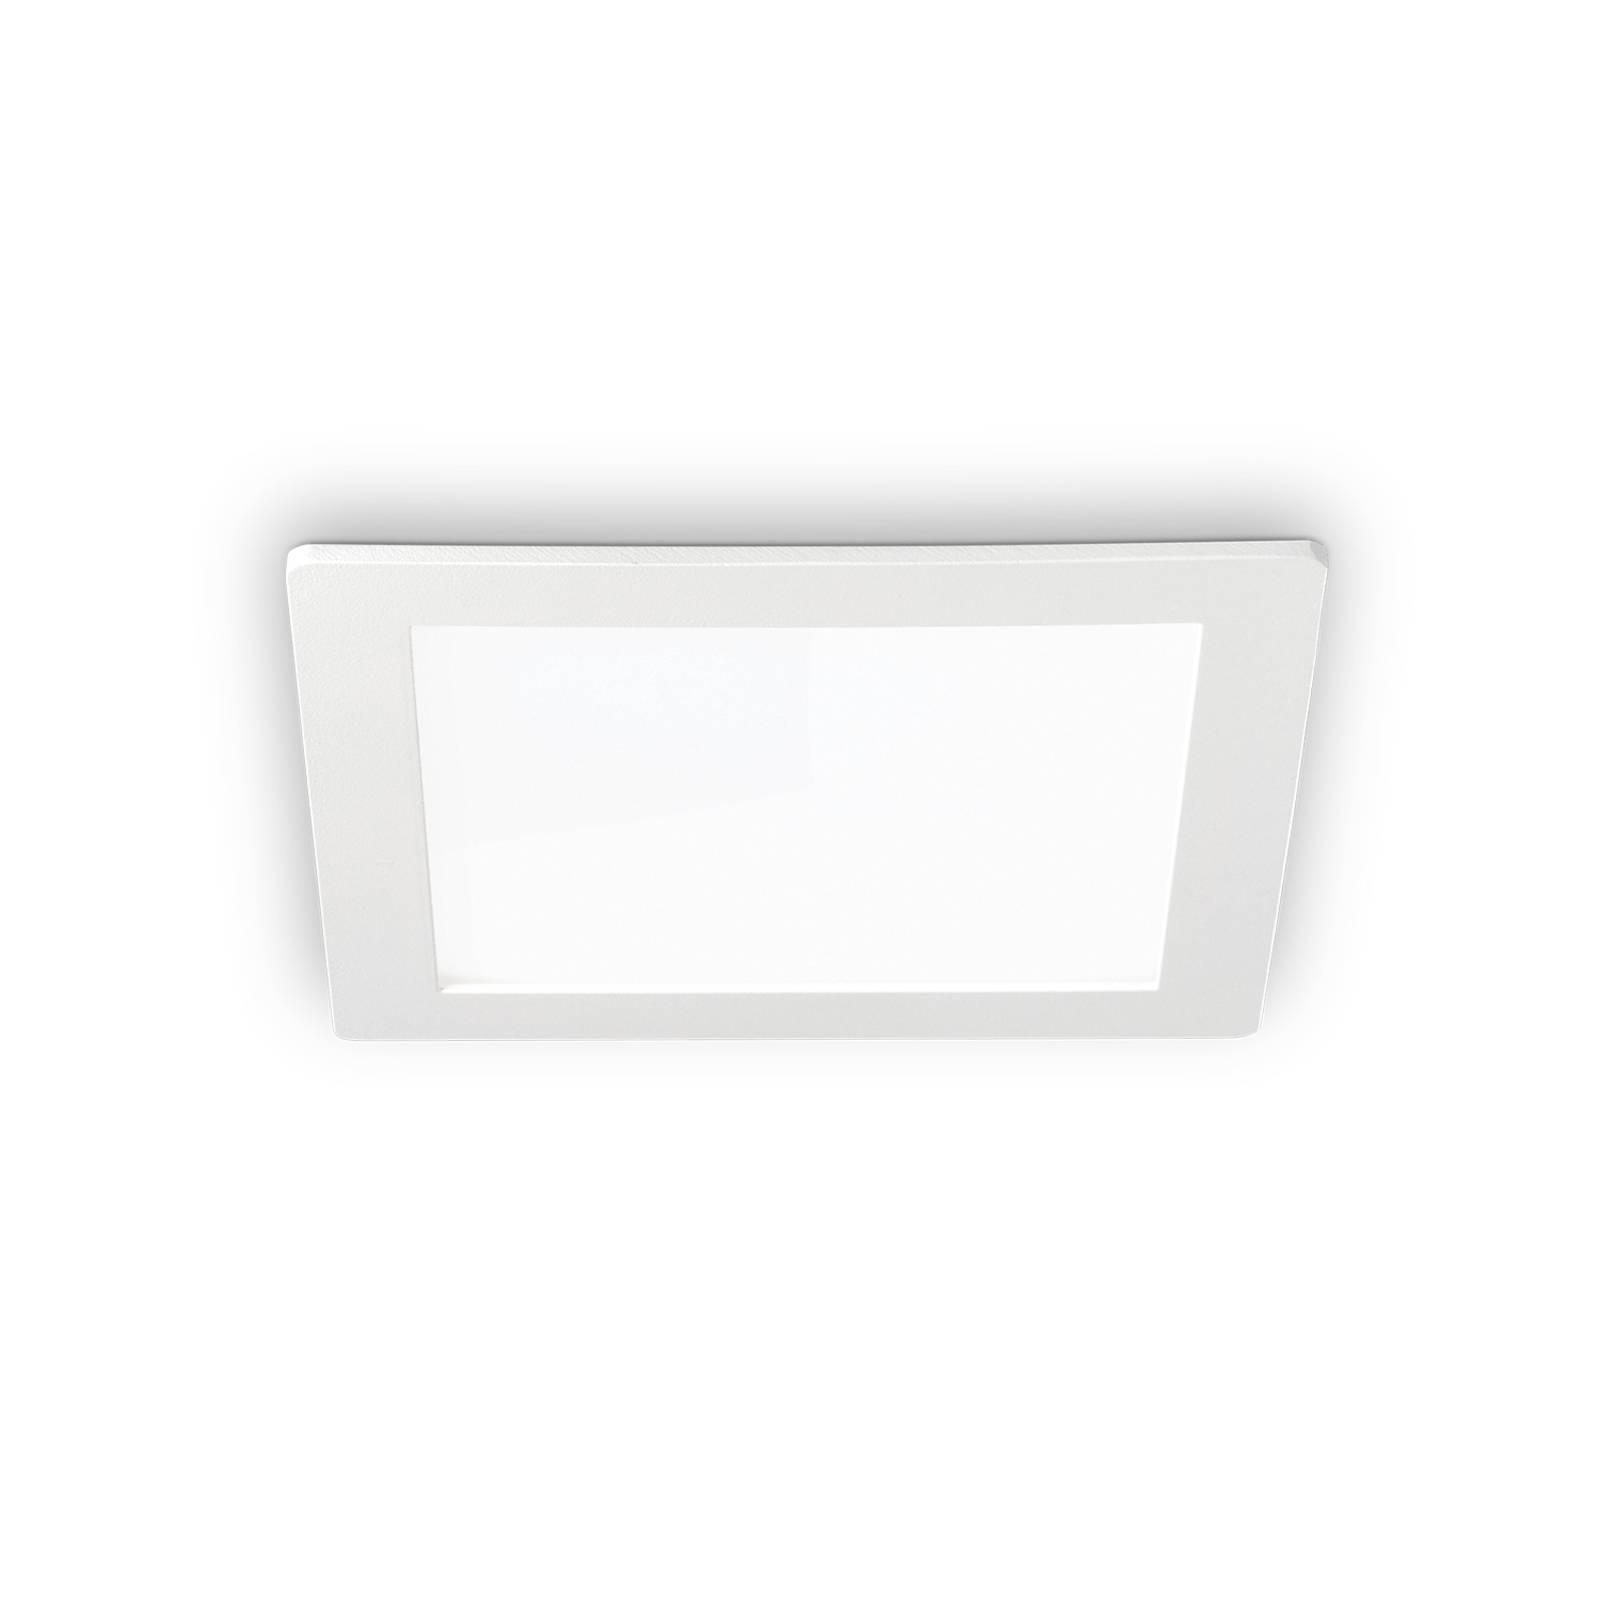 Lampa sufitowa LED Groove square 11,8x11,8 cm